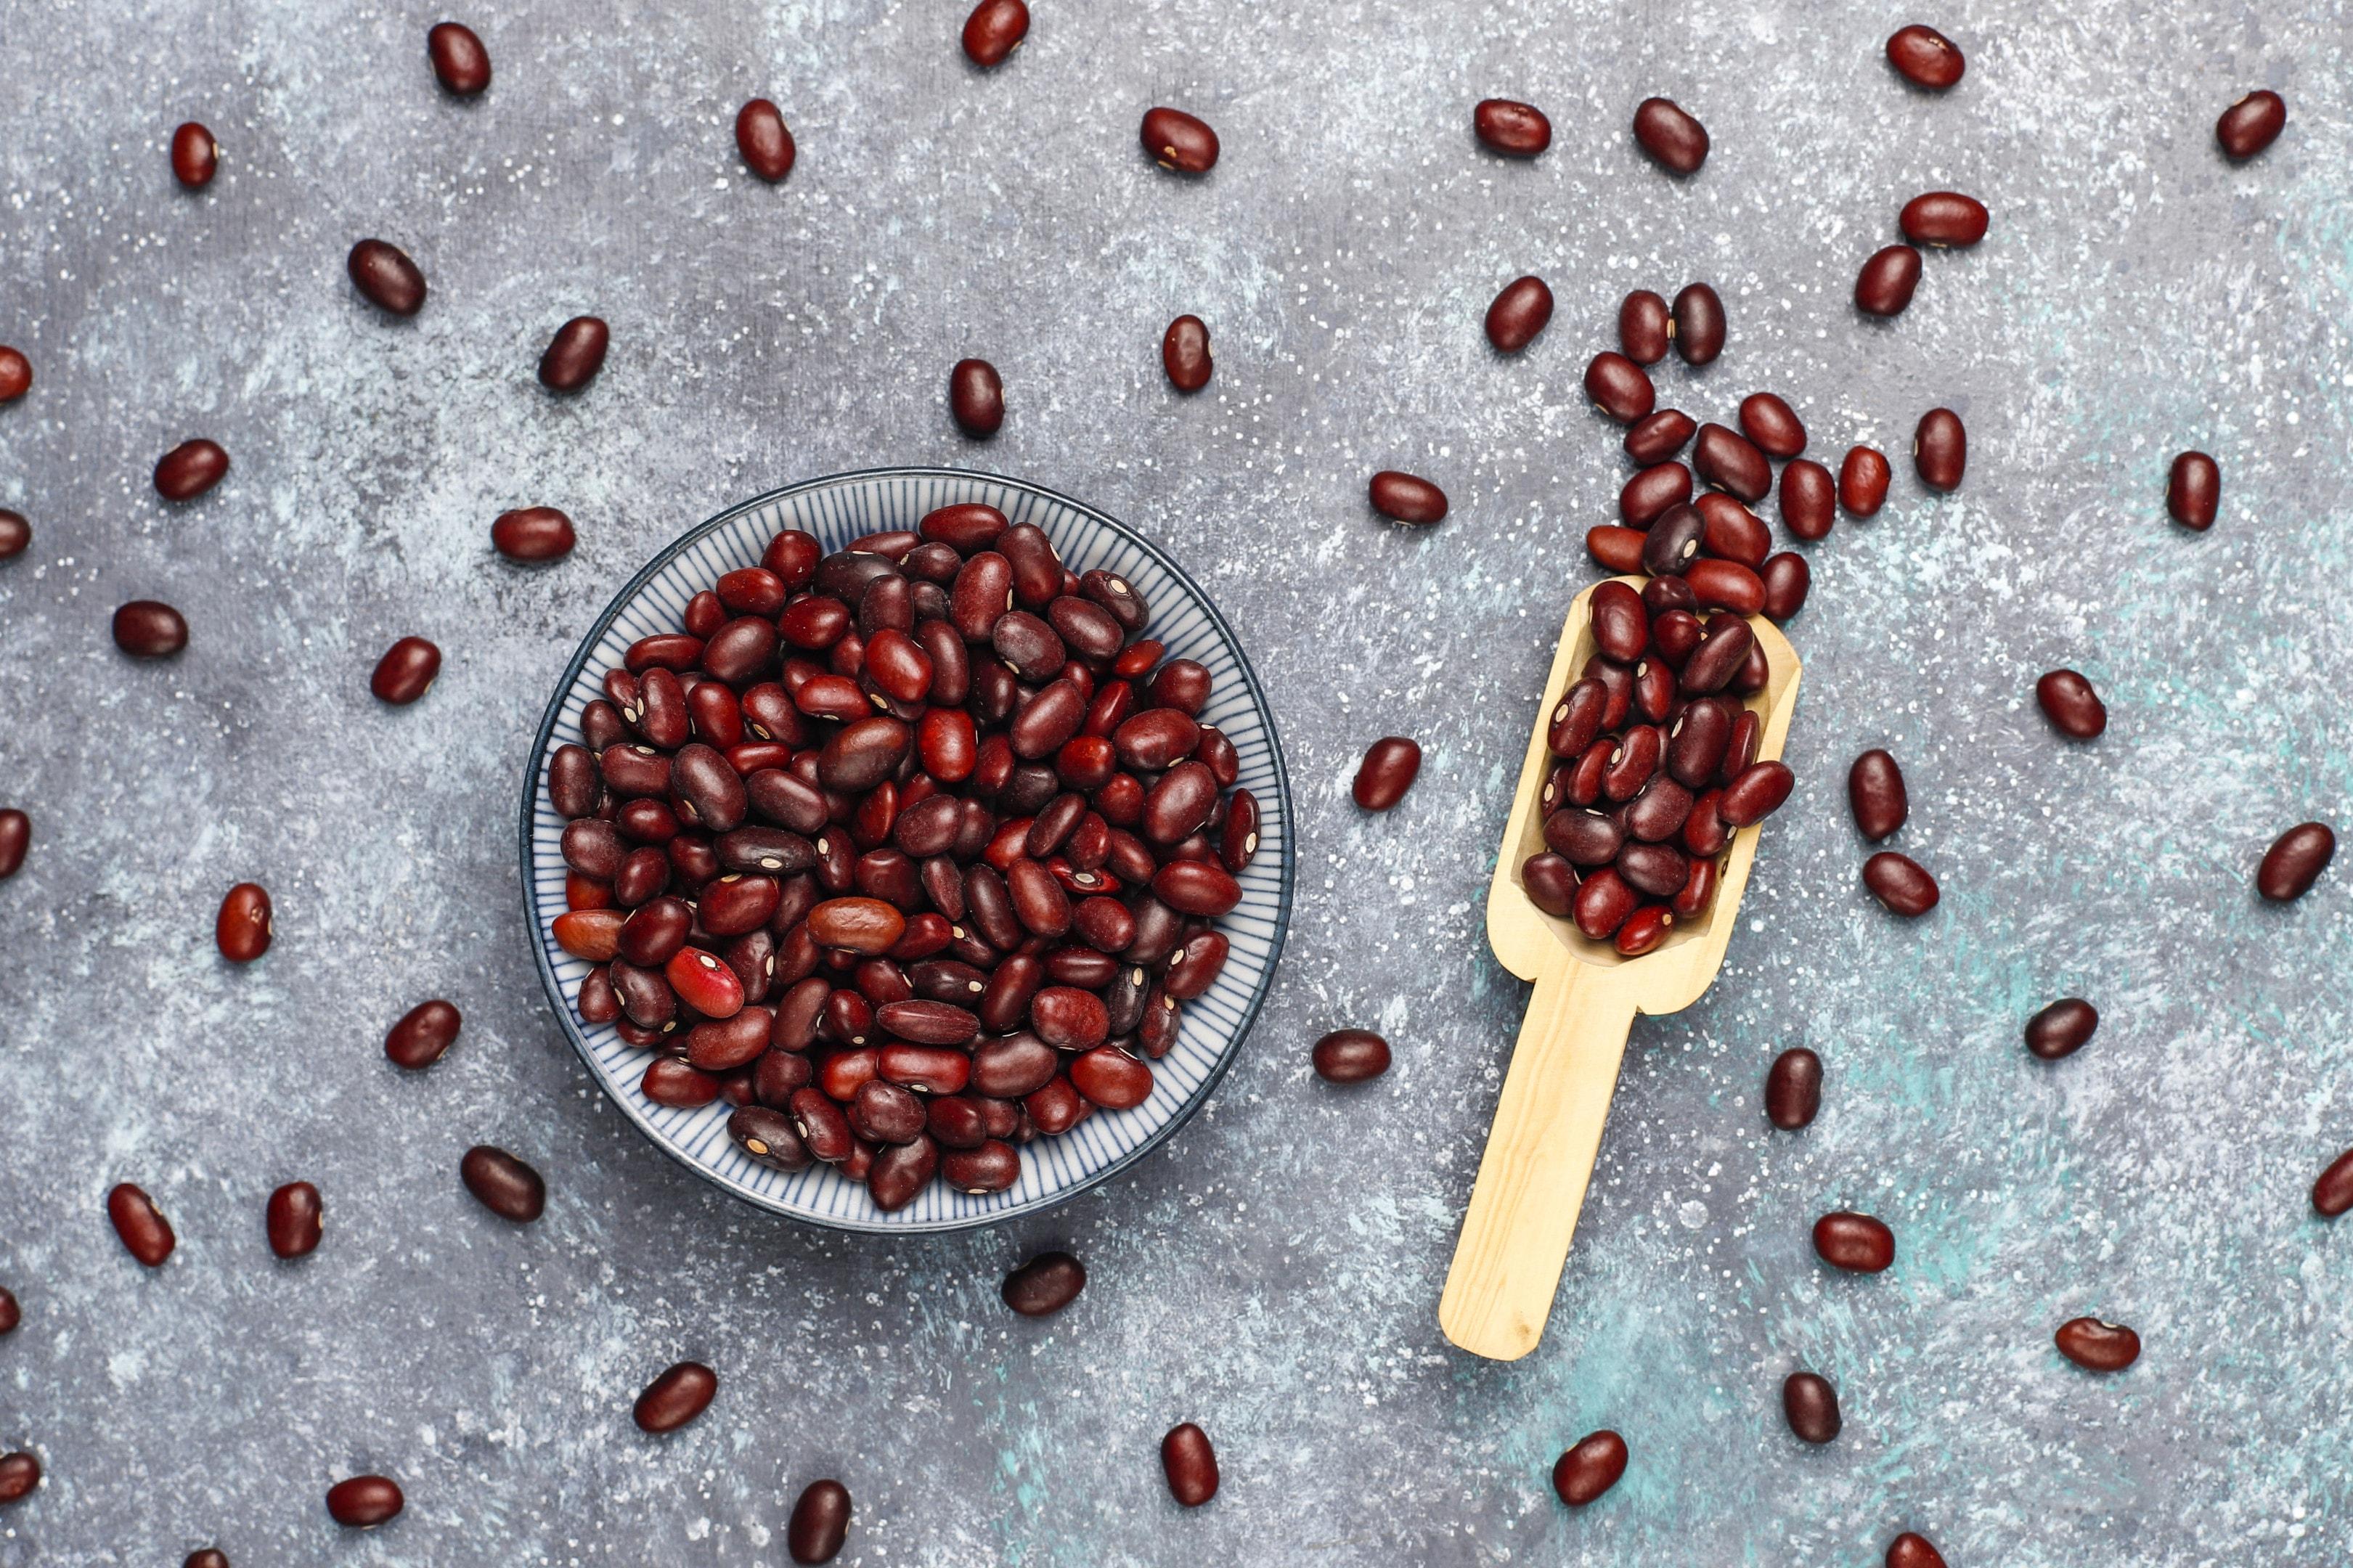 Adzuki beans assortment in a bowl